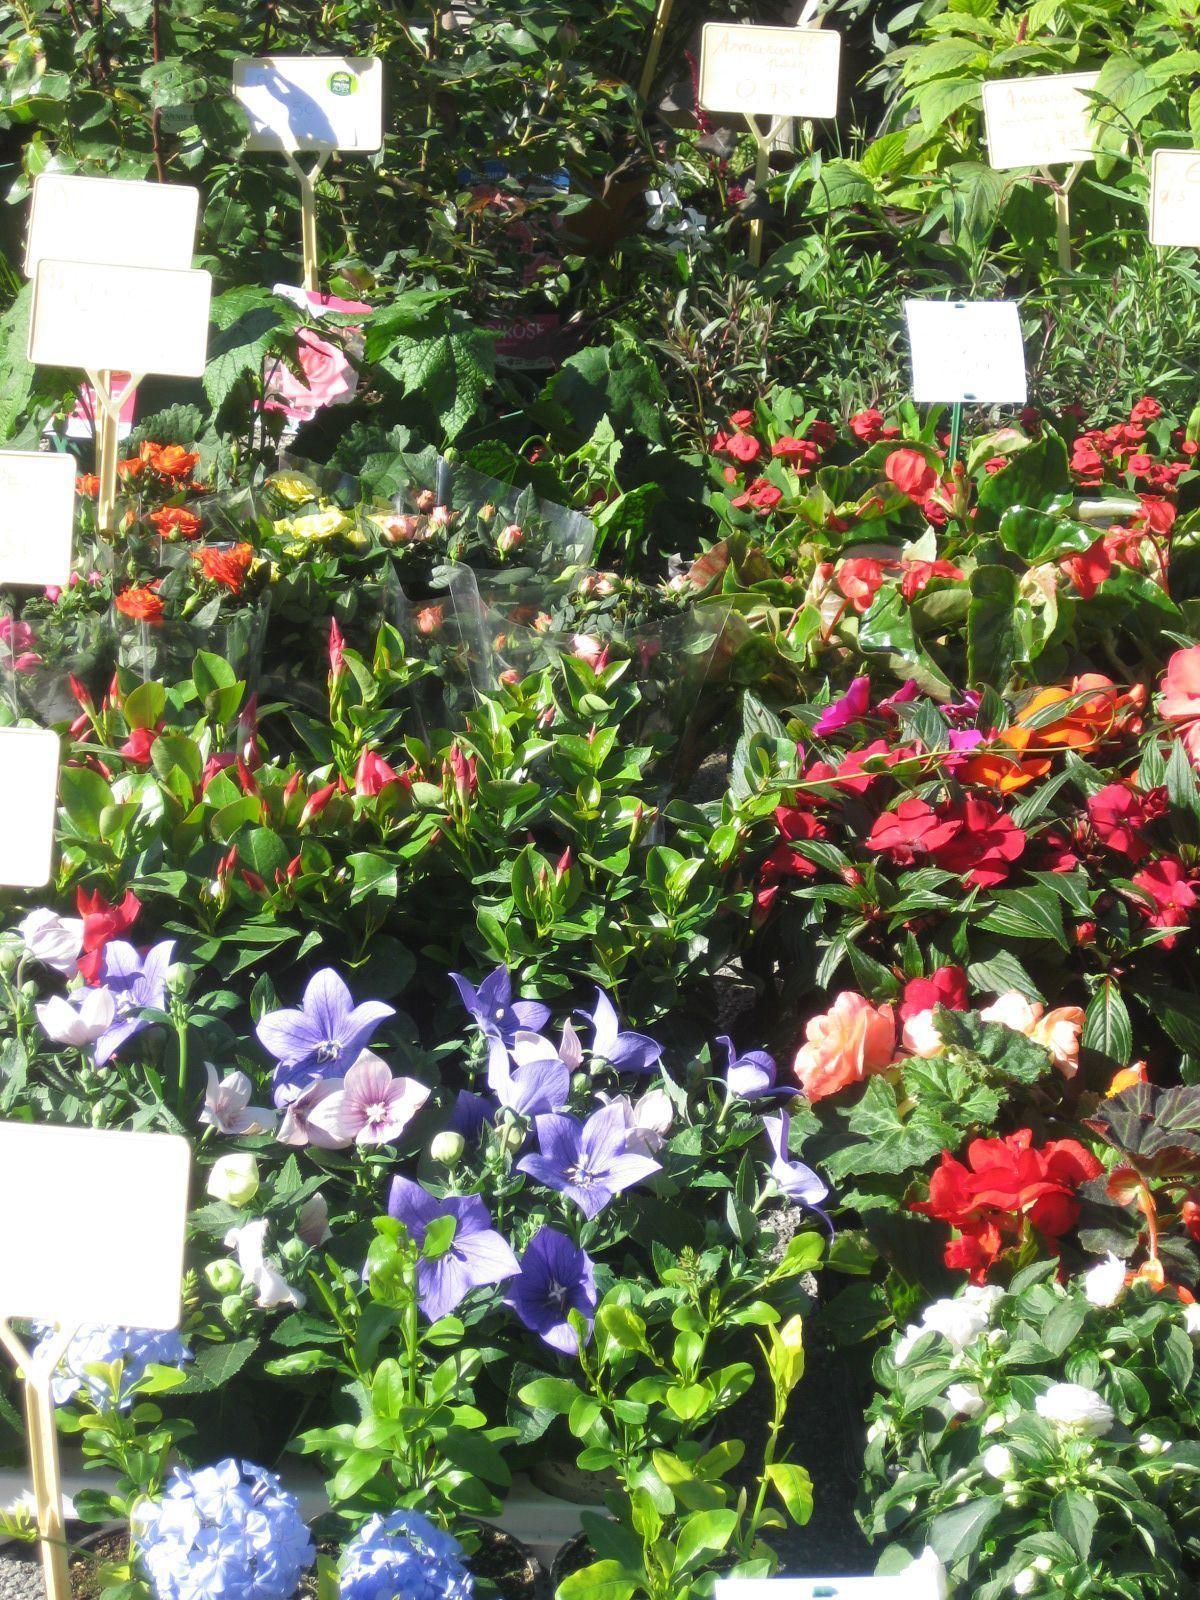 Le march des plants 1 les fleurs espinasses 05 for Www jardiner malin fr